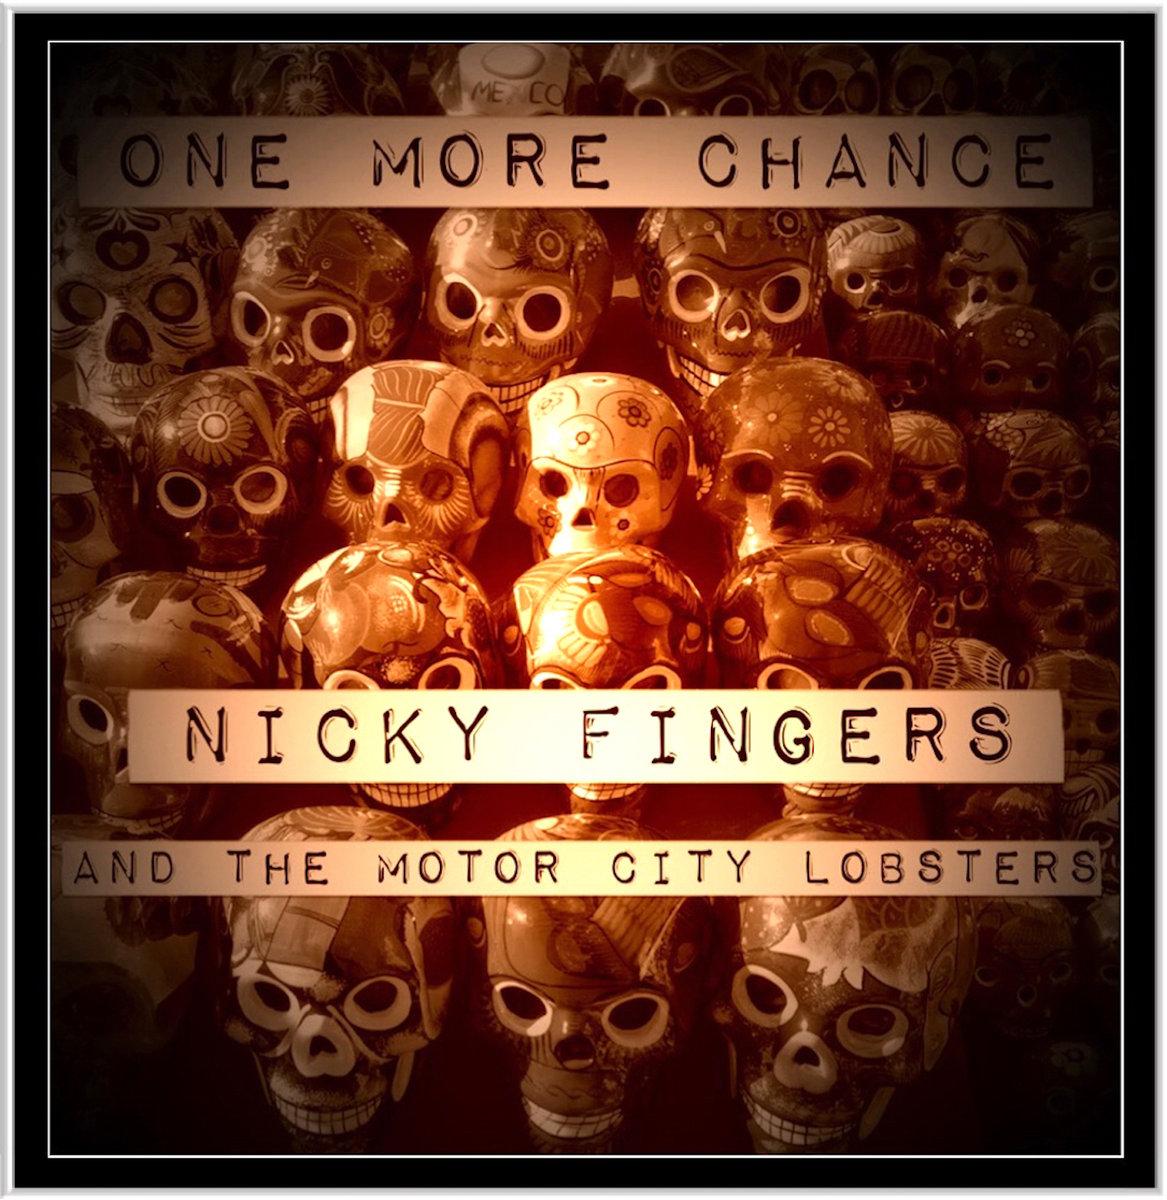 nicky fingers